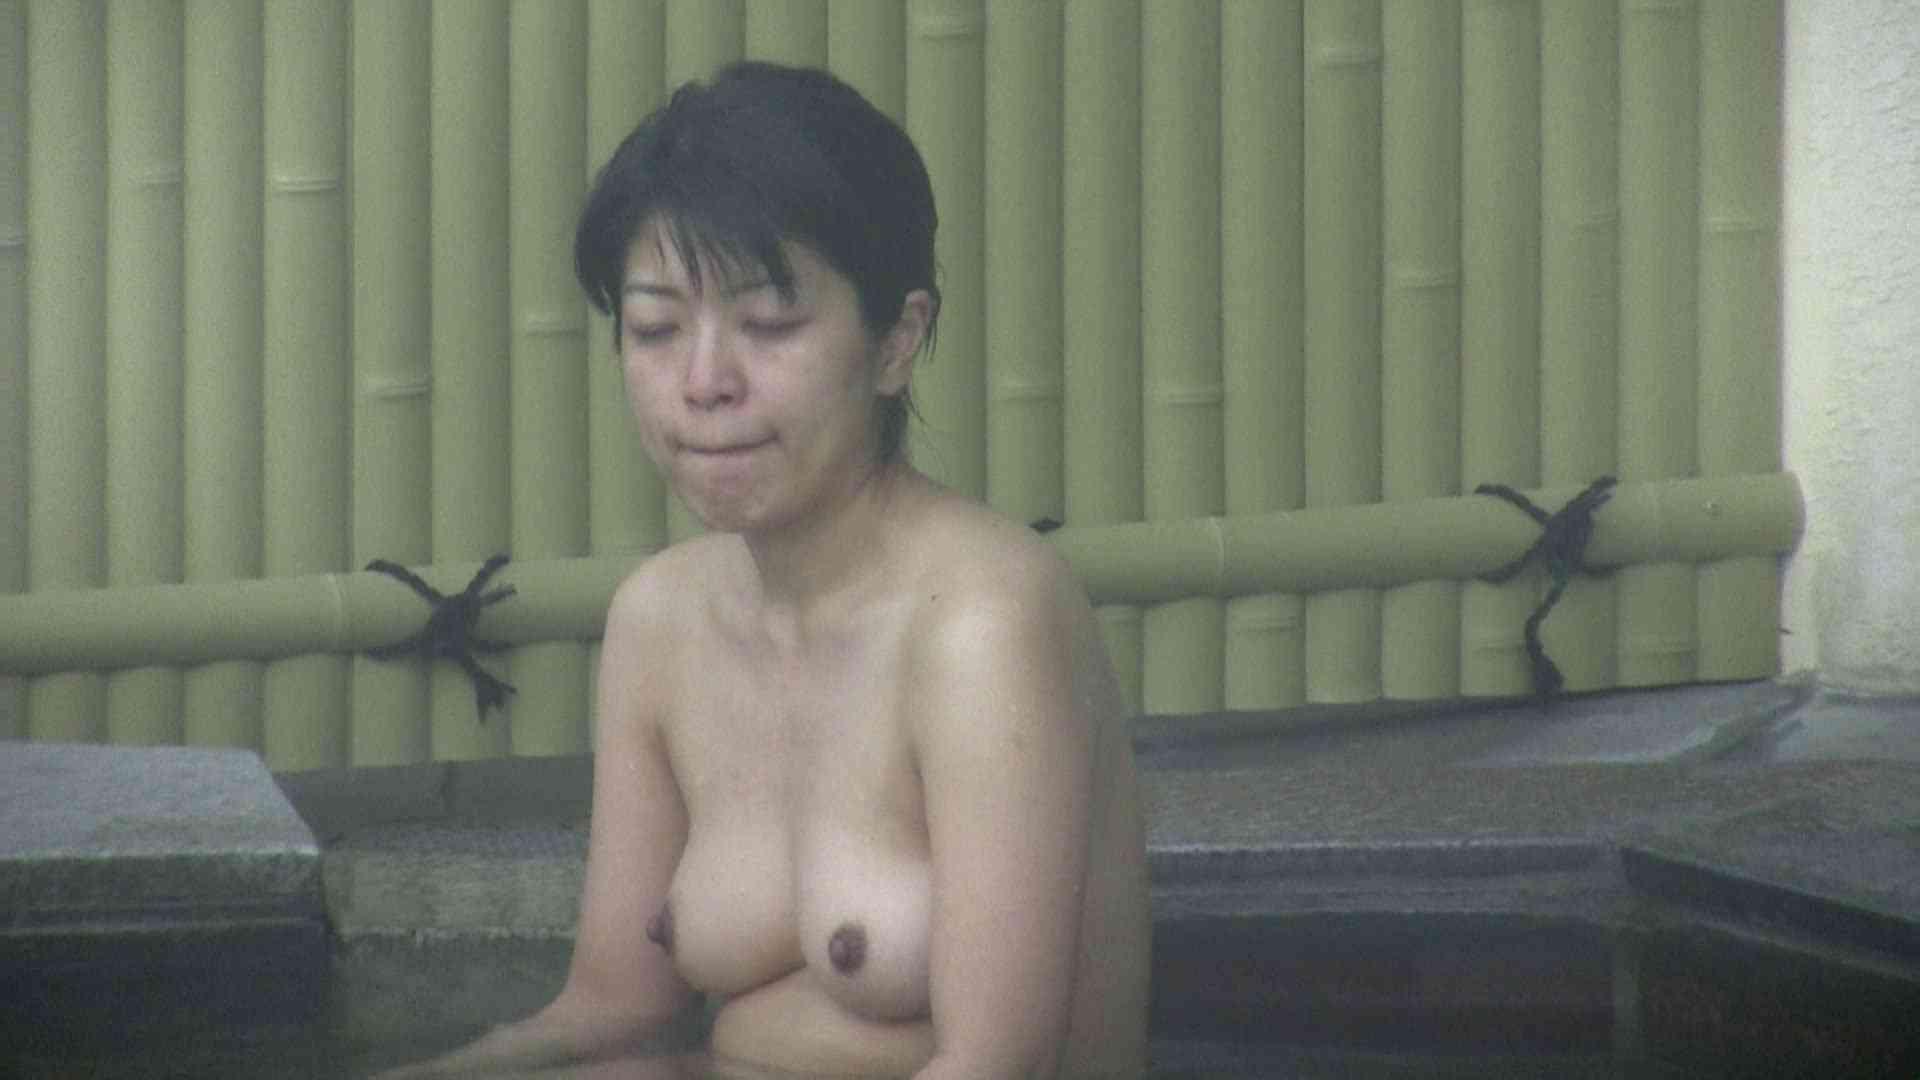 Aquaな露天風呂Vol.585 HなOL | 盗撮  93pic 34